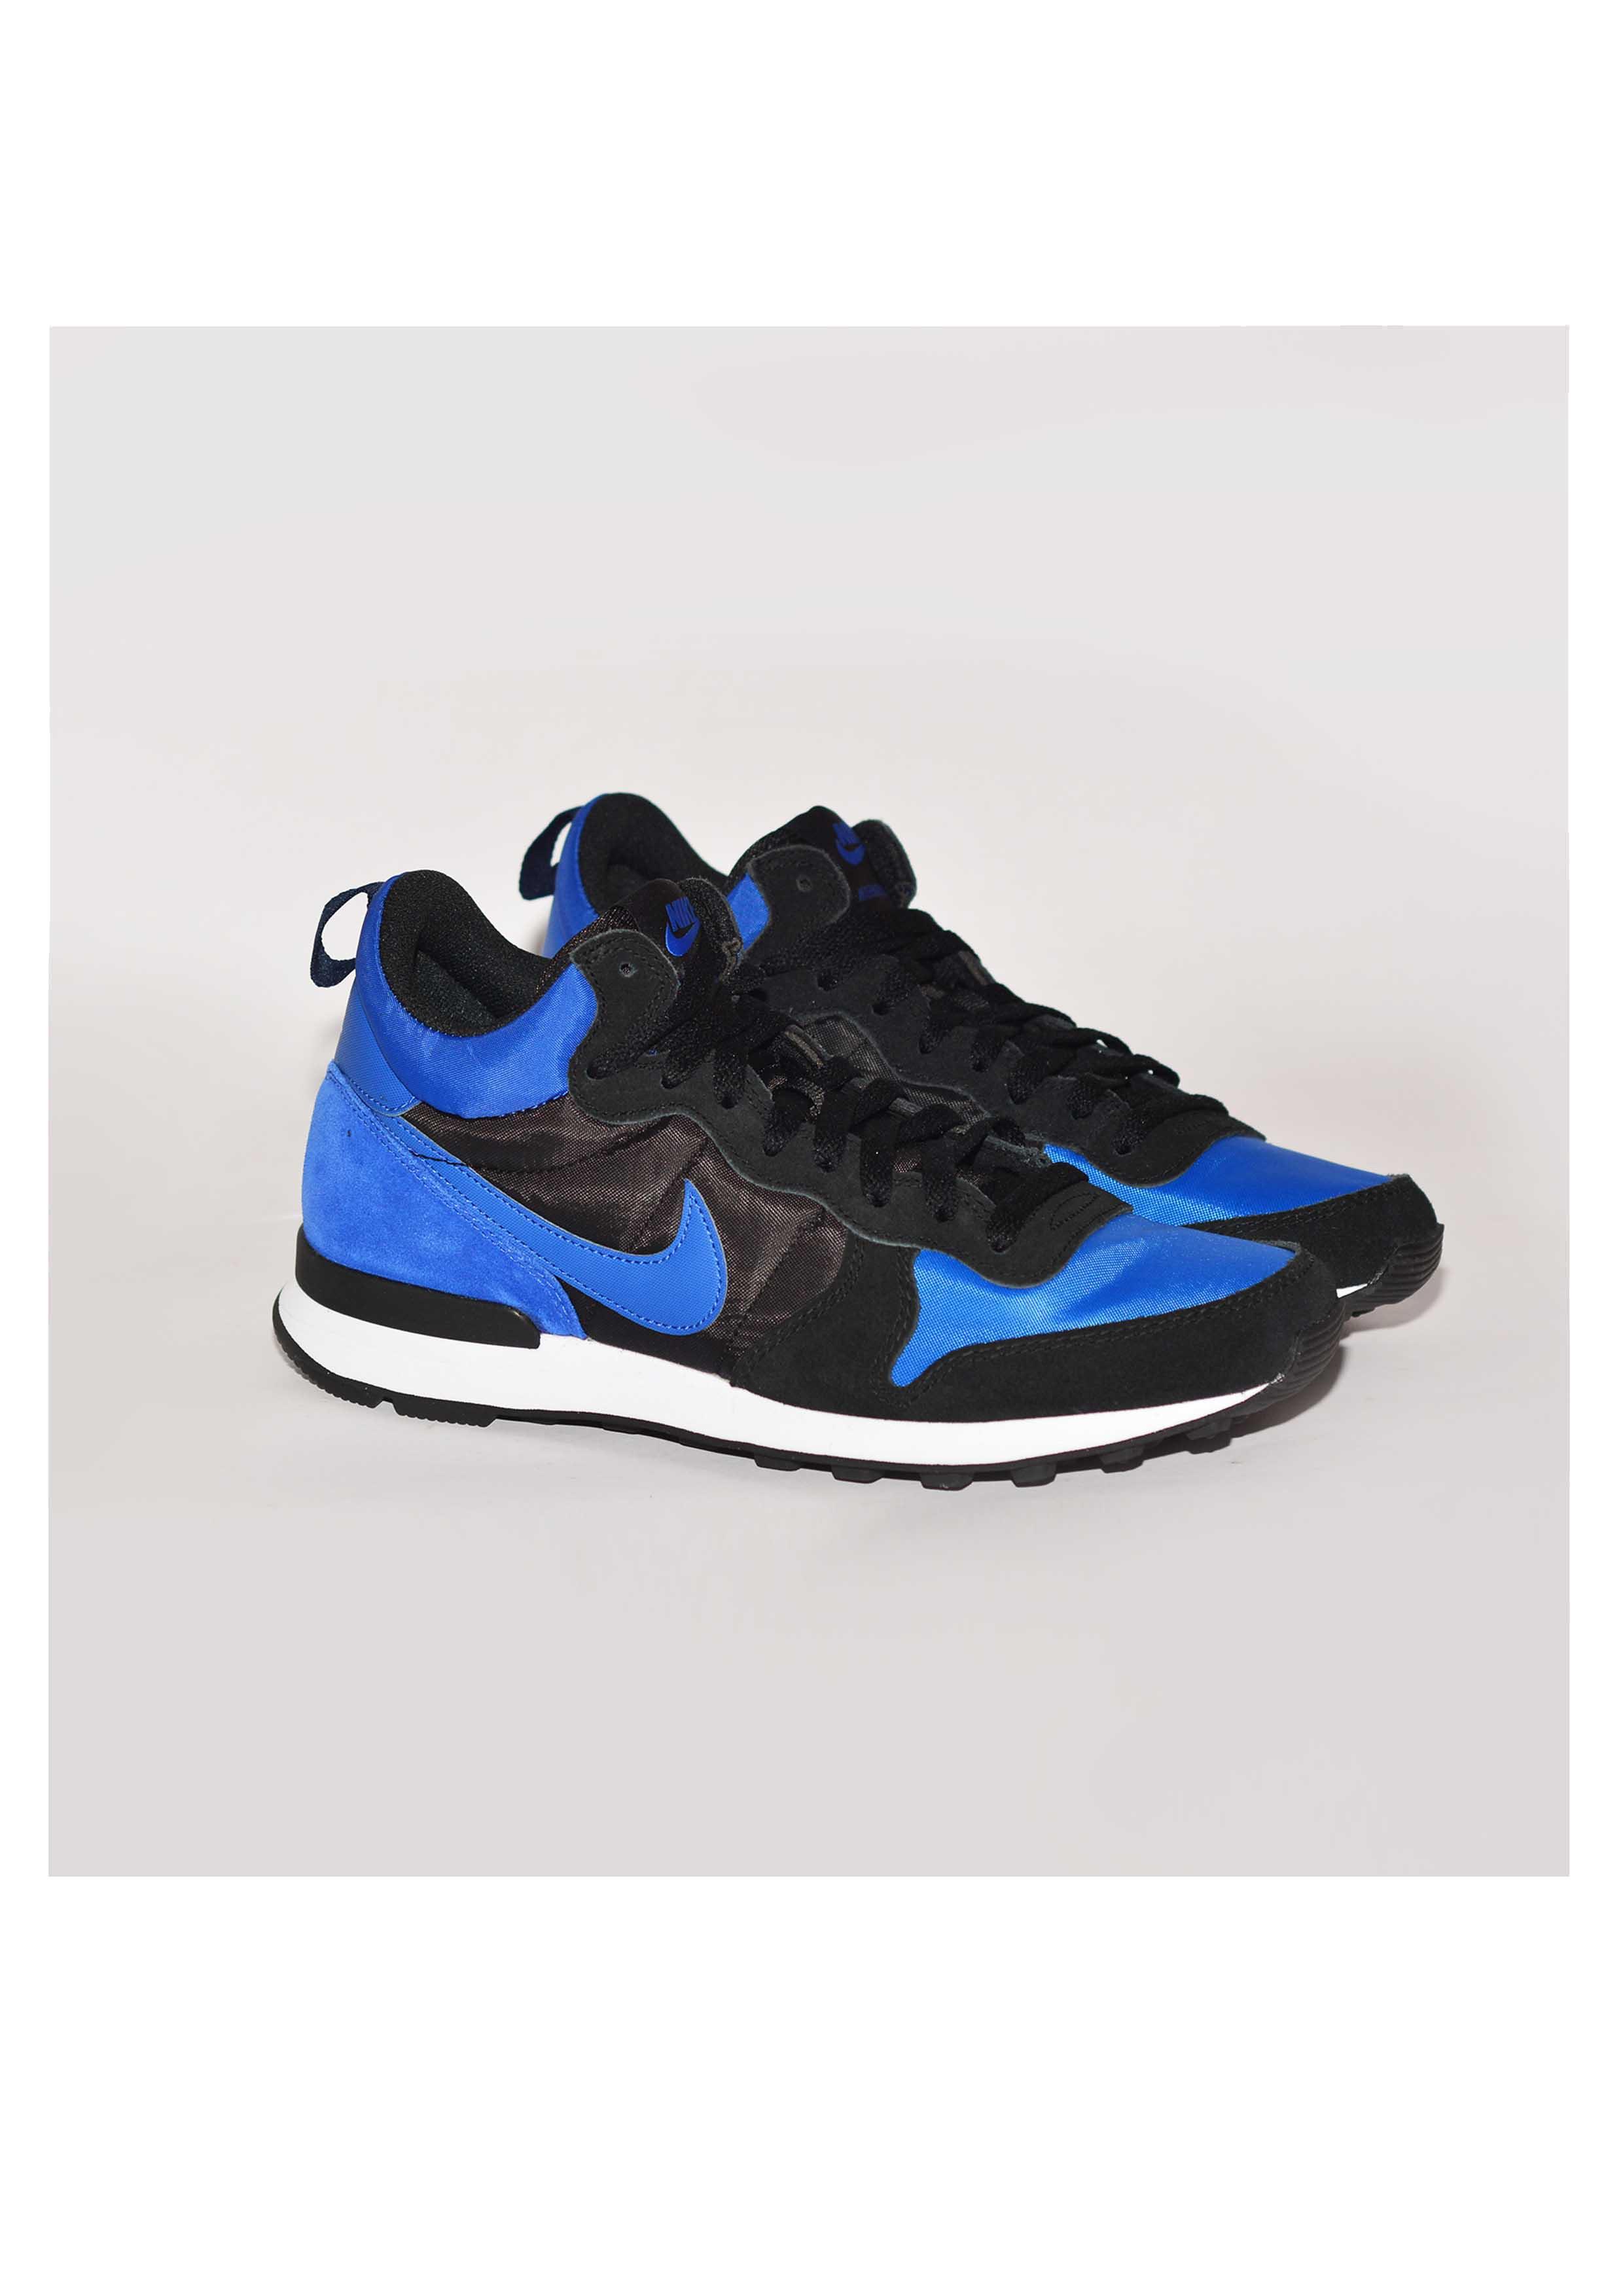 ... Sikilmacak Sneaker Store/NIKE INTERNATIONALIST MID – VARSITY ROYAL /  BLACK / WHITE. Sale! ; 